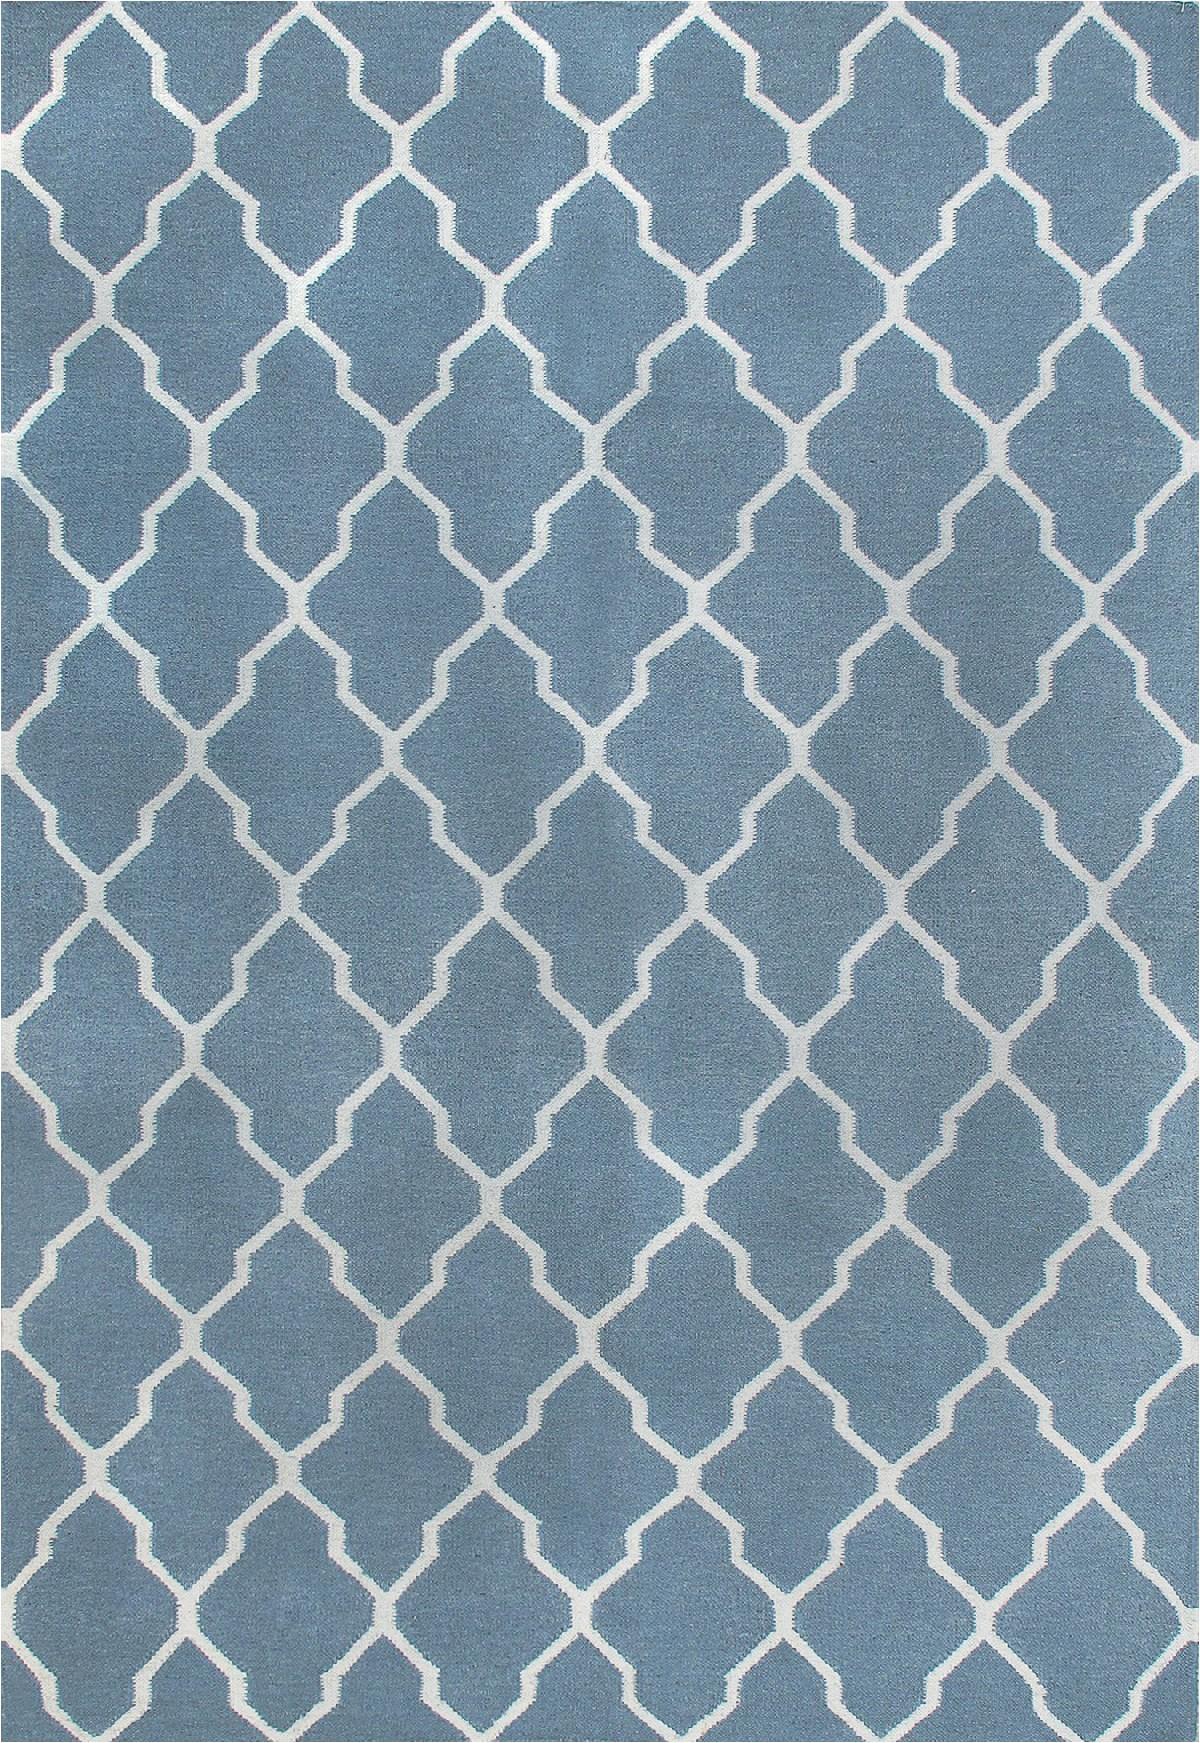 rugsville kilims light blue wool 810 rug 8x10